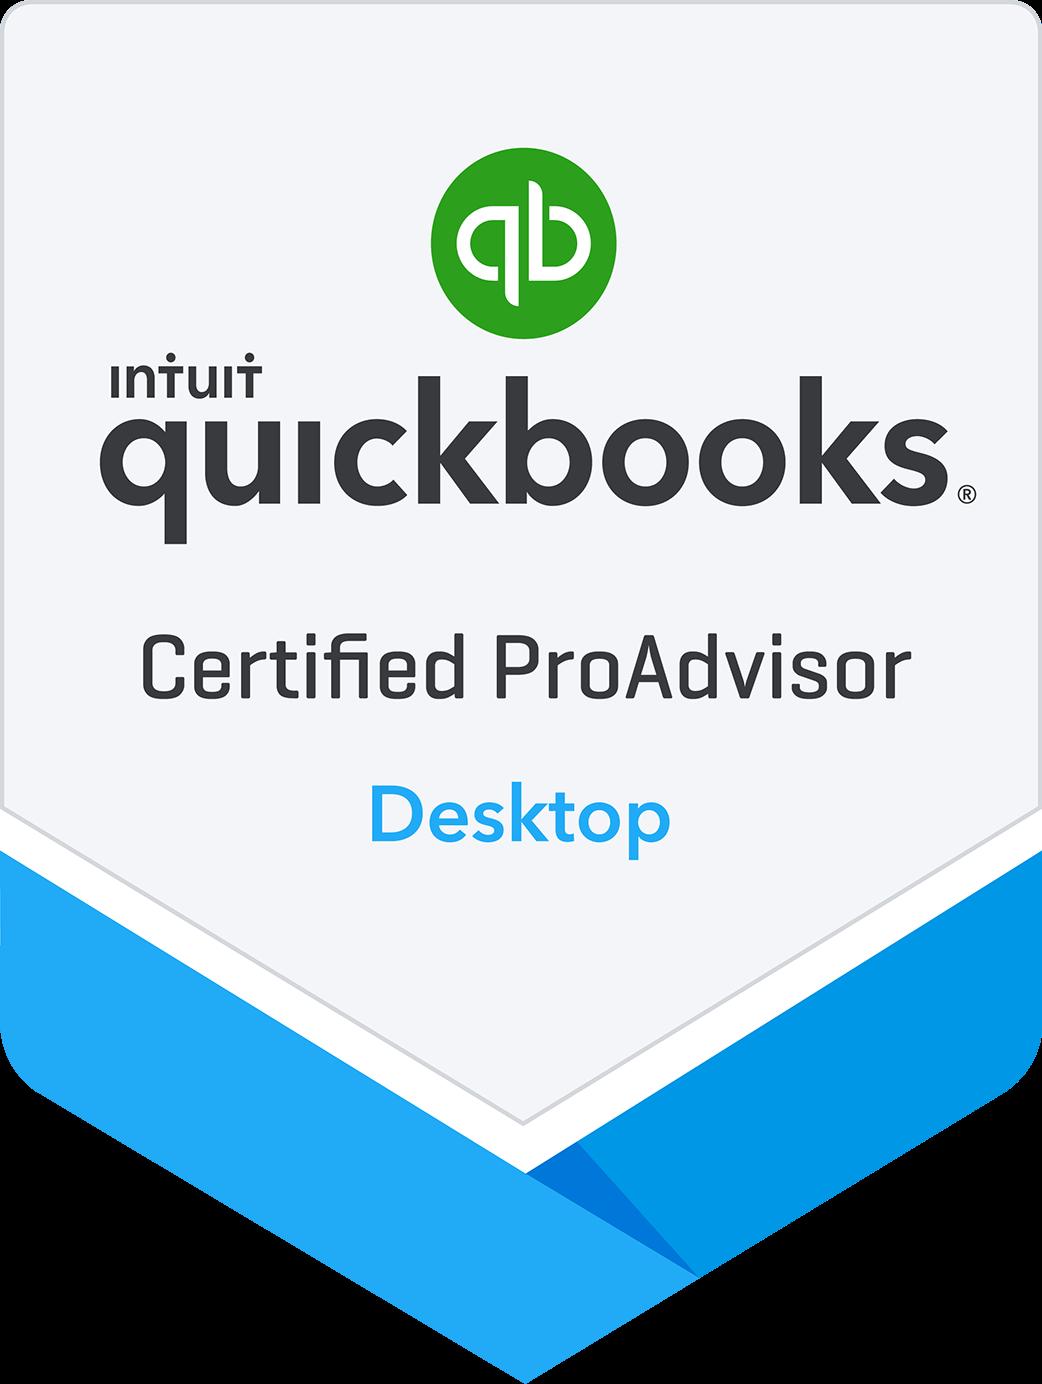 QuickBooks Certified Proadvisor Badge